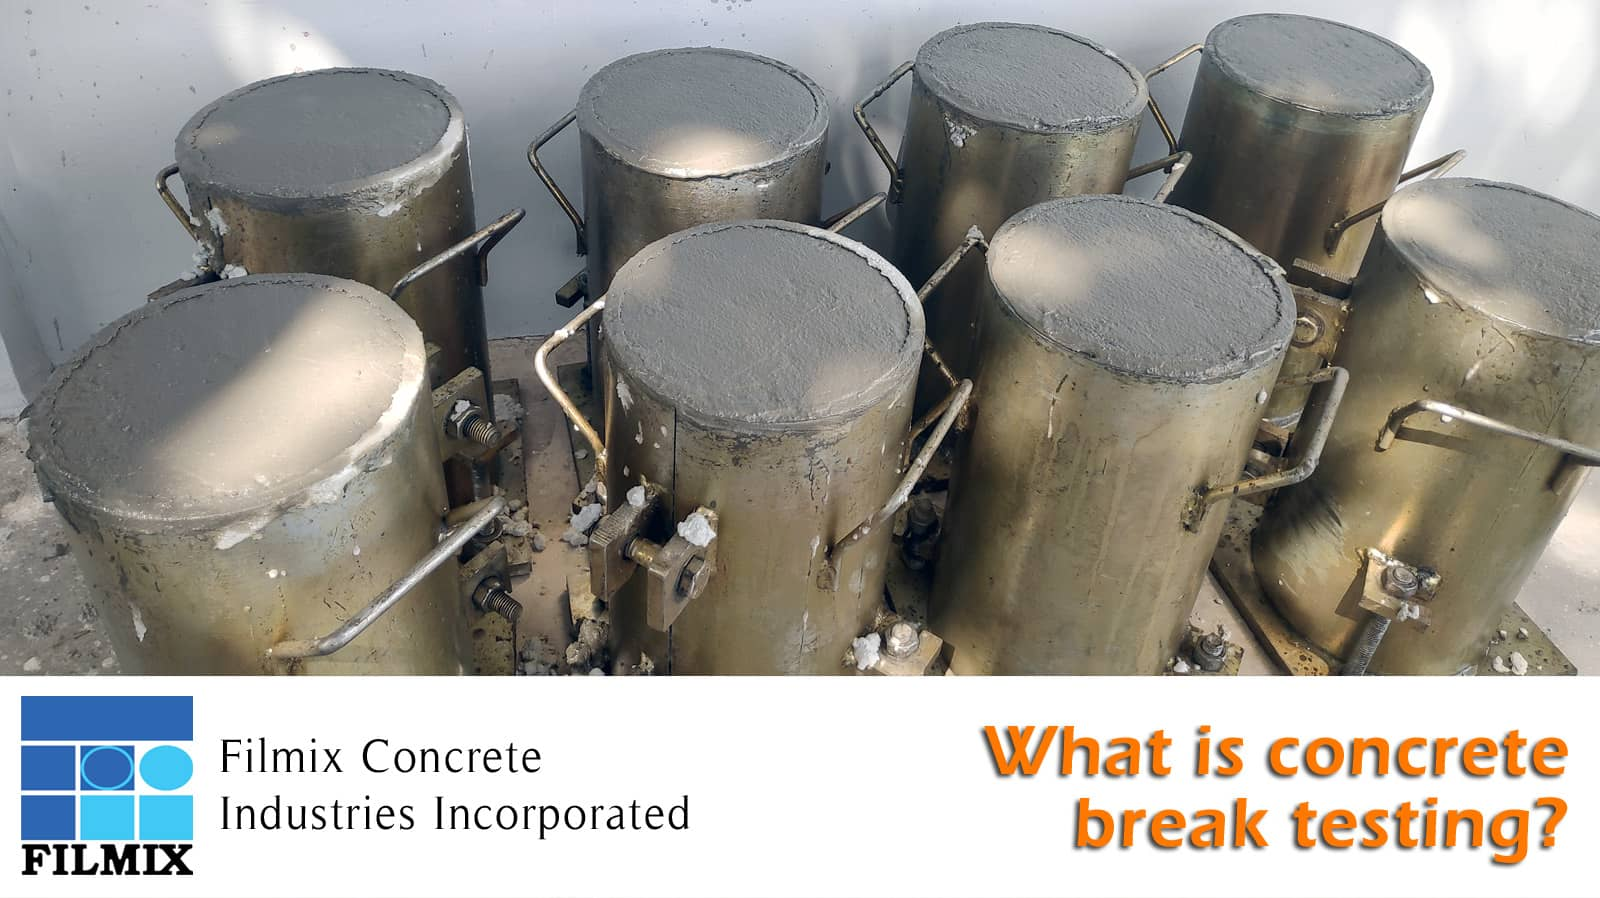 What is concrete break testing?